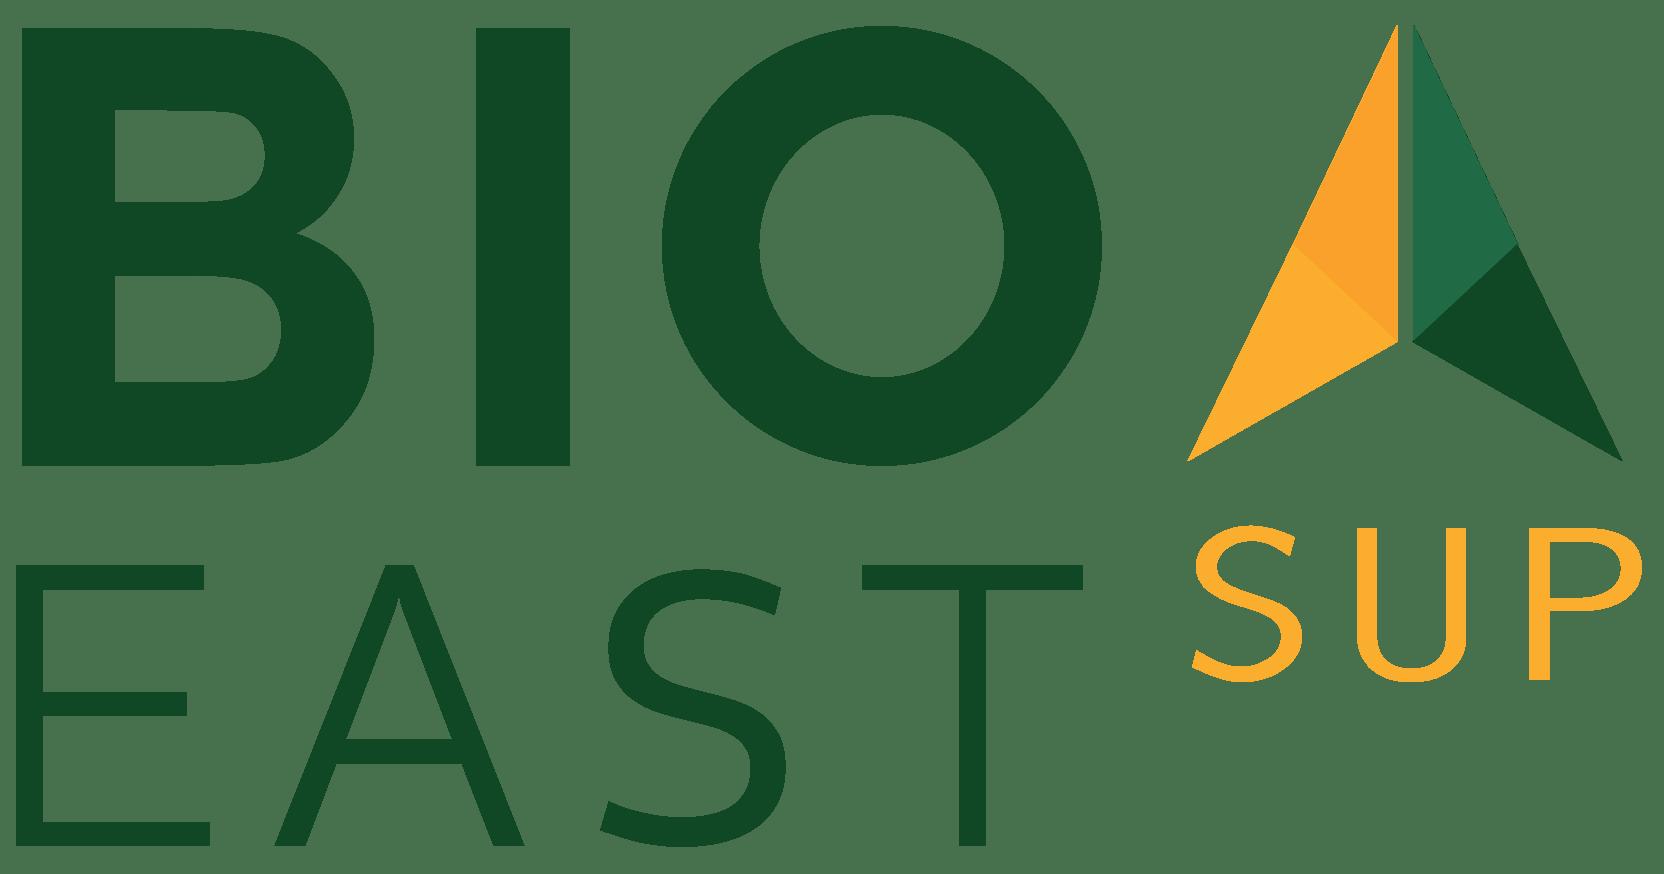 BioeastsUp logo